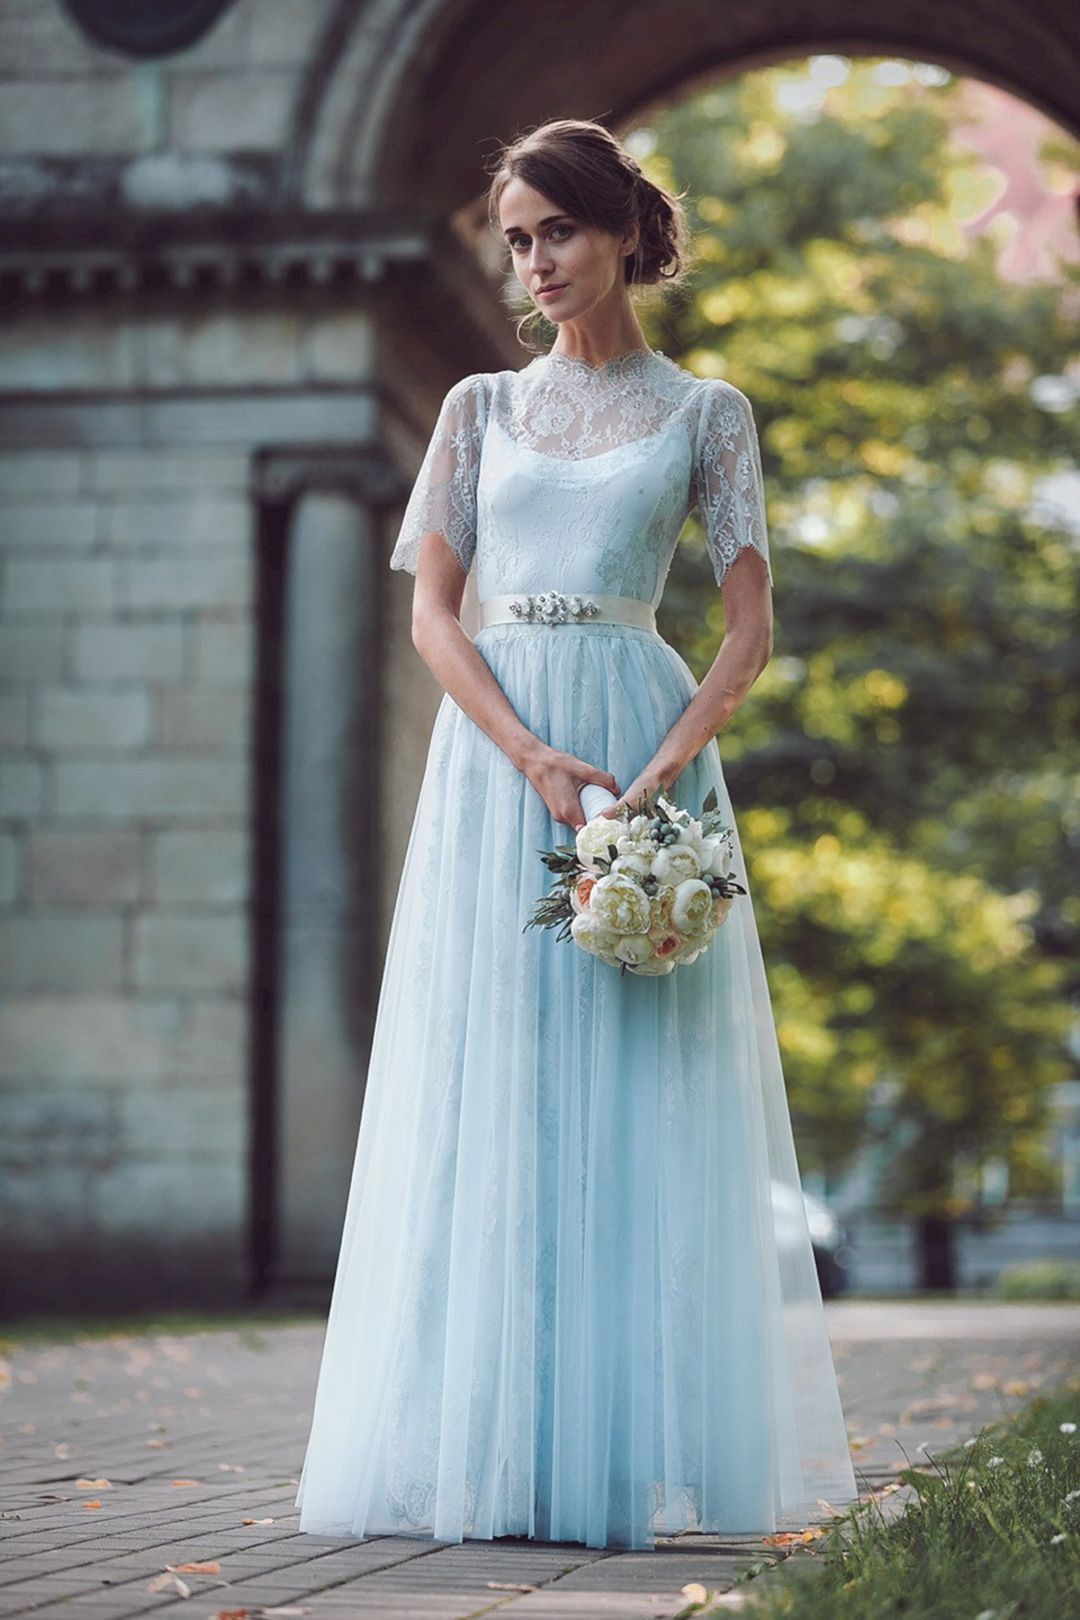 25+ Extraordinary Blue Wedding Dress Ideas For Bride Steal